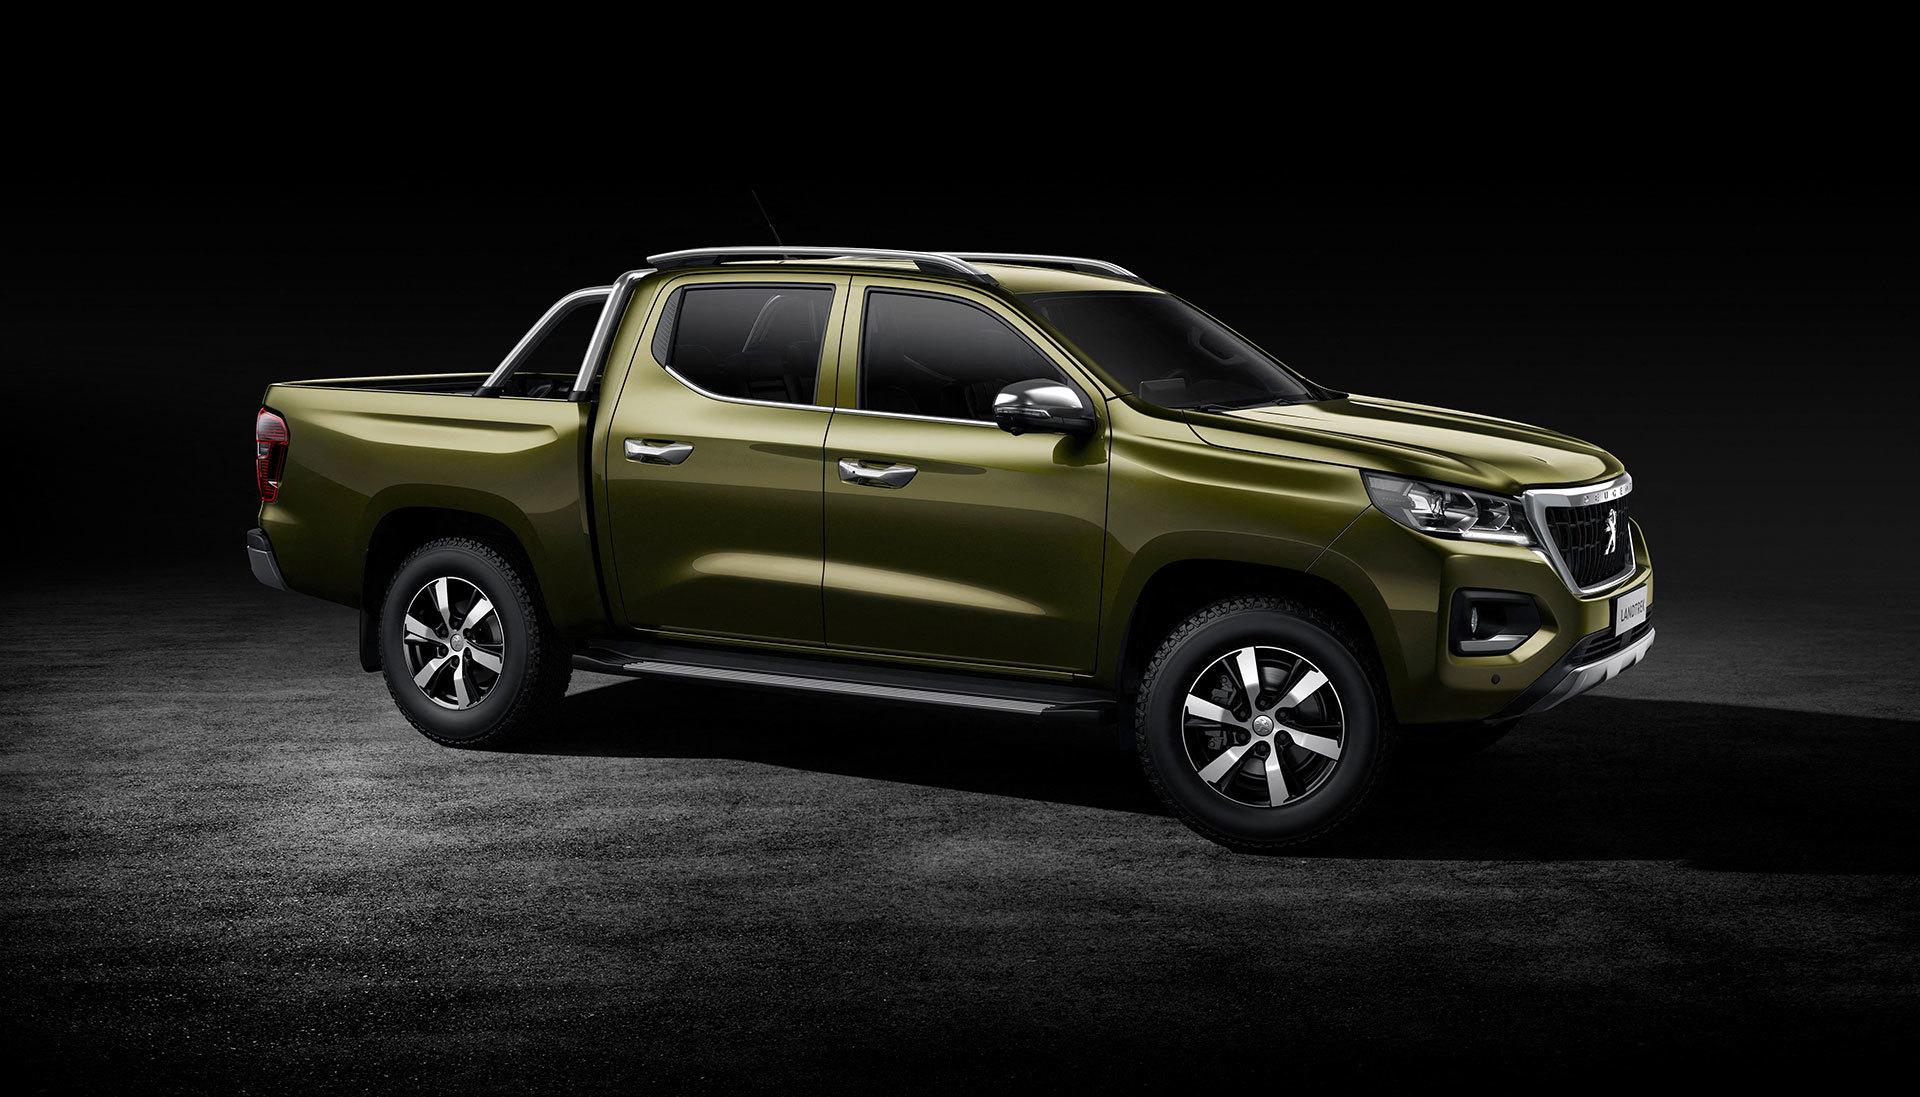 Peugeot Landtrek 2020 Pick Up 4x4 10